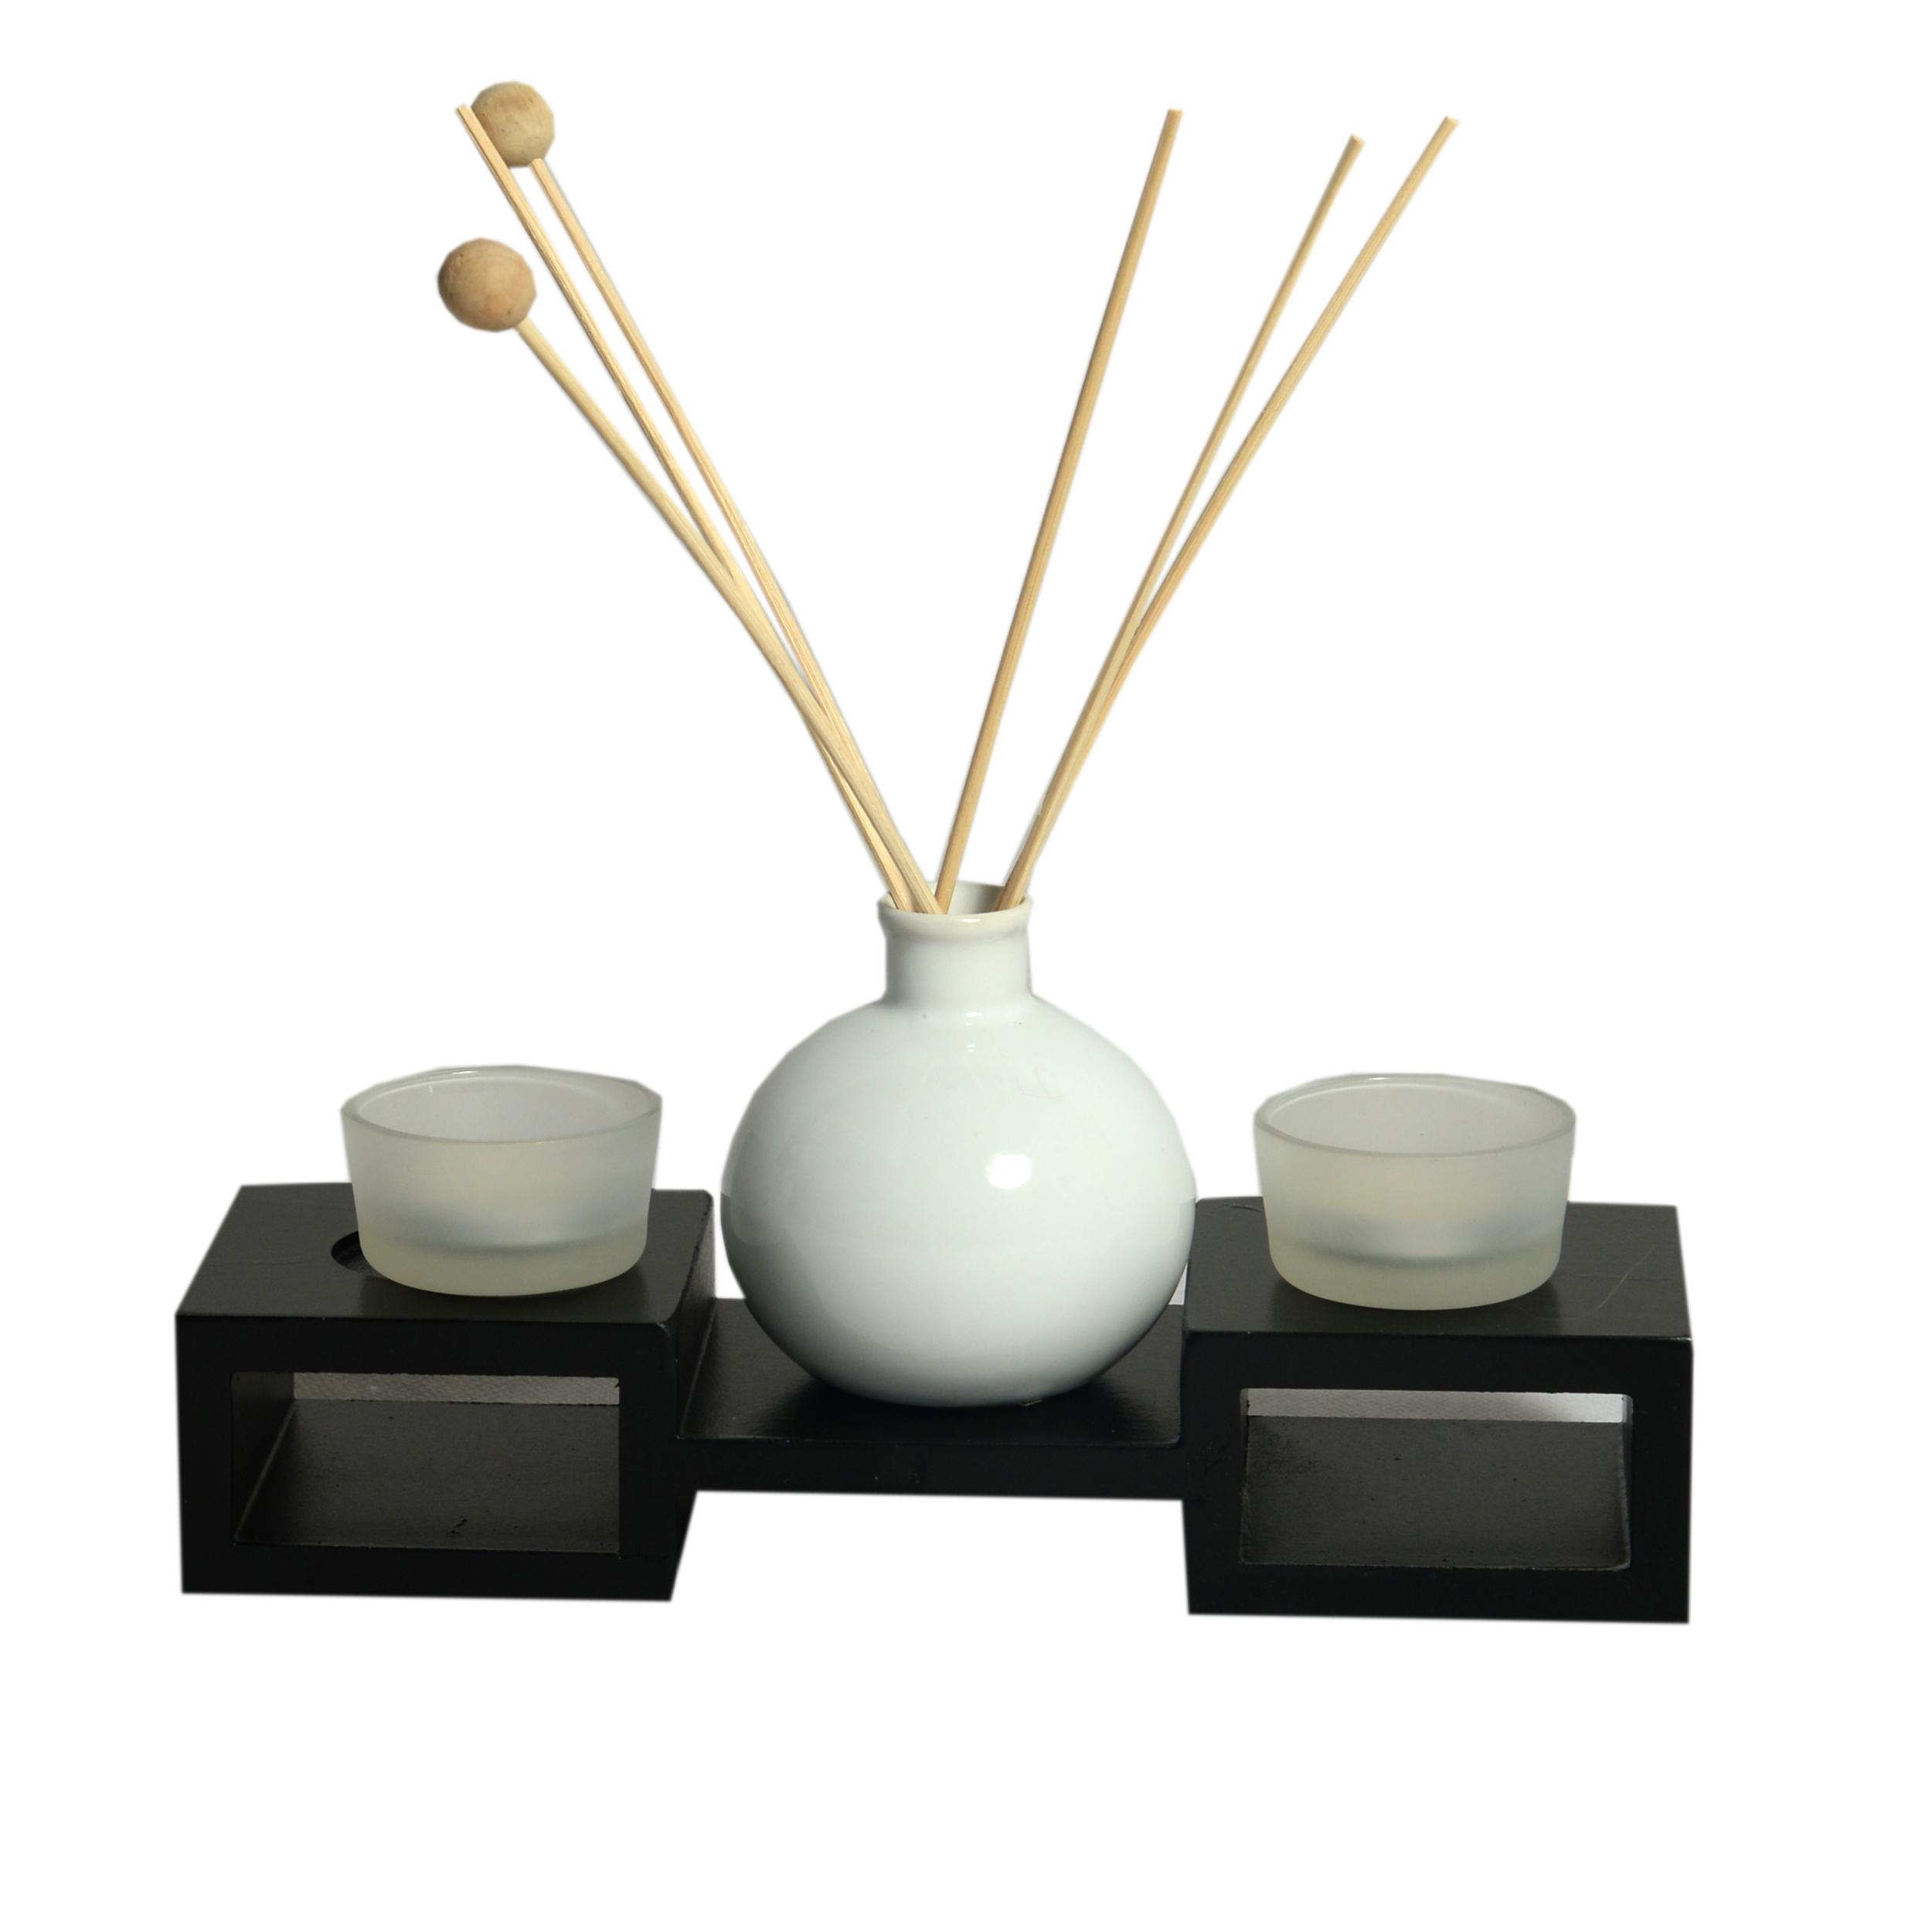 جاشمعی مدل Rattan incense